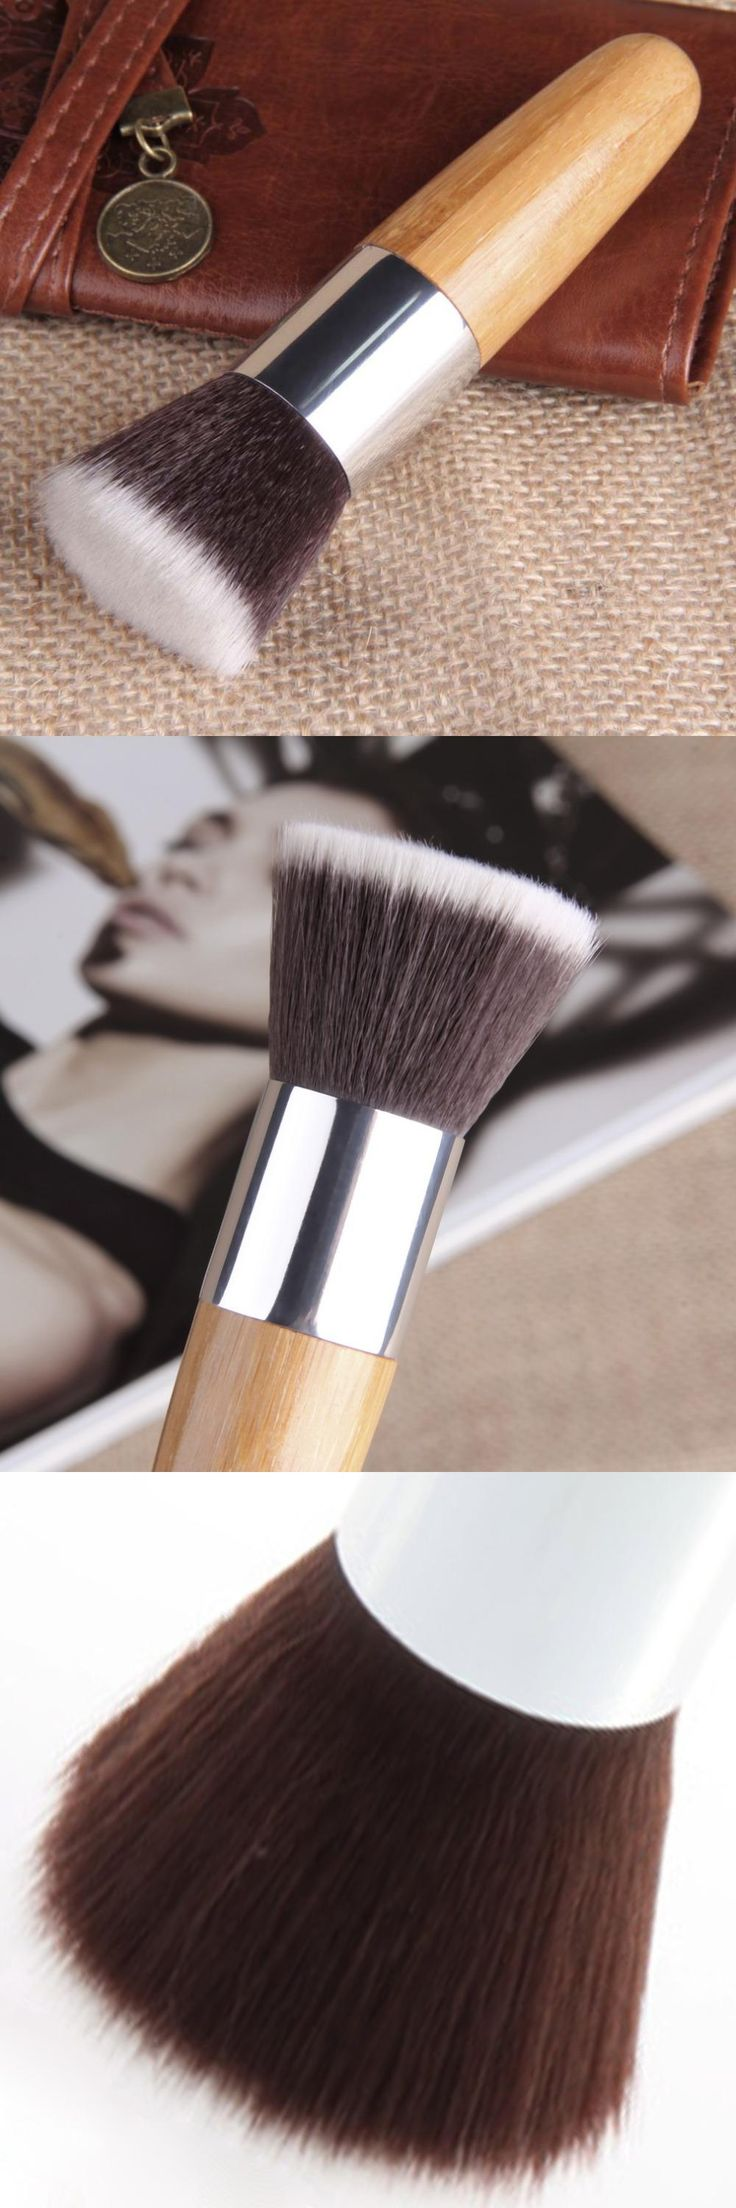 [Visit to Buy] Makeup Brush Flat Top Brush Foundation Powder beauty Brush Cosmetic Make up brushesTool Wooden Kabuki Make-up Brush new #Advertisement